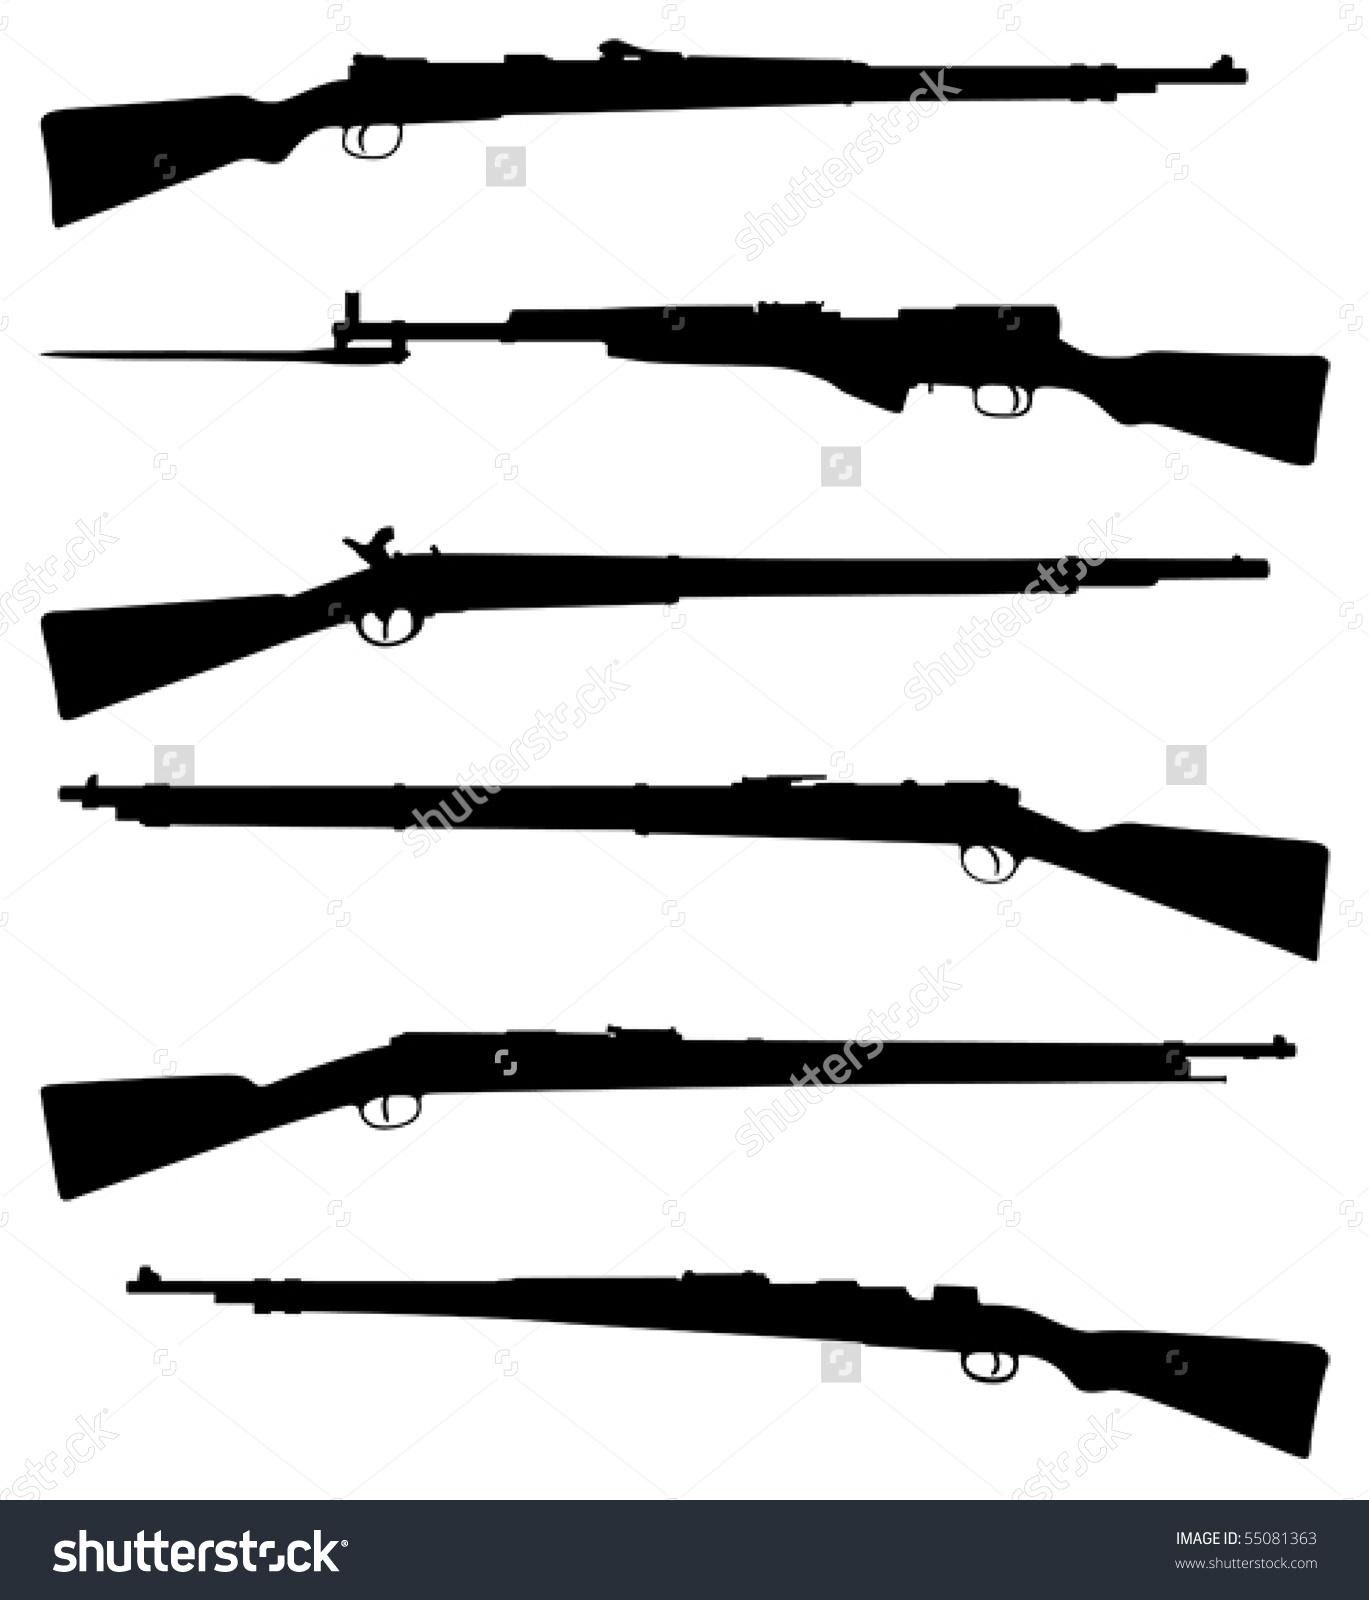 Six Old Shotguns Black On White Detailed Silhouettes Stock Vector.